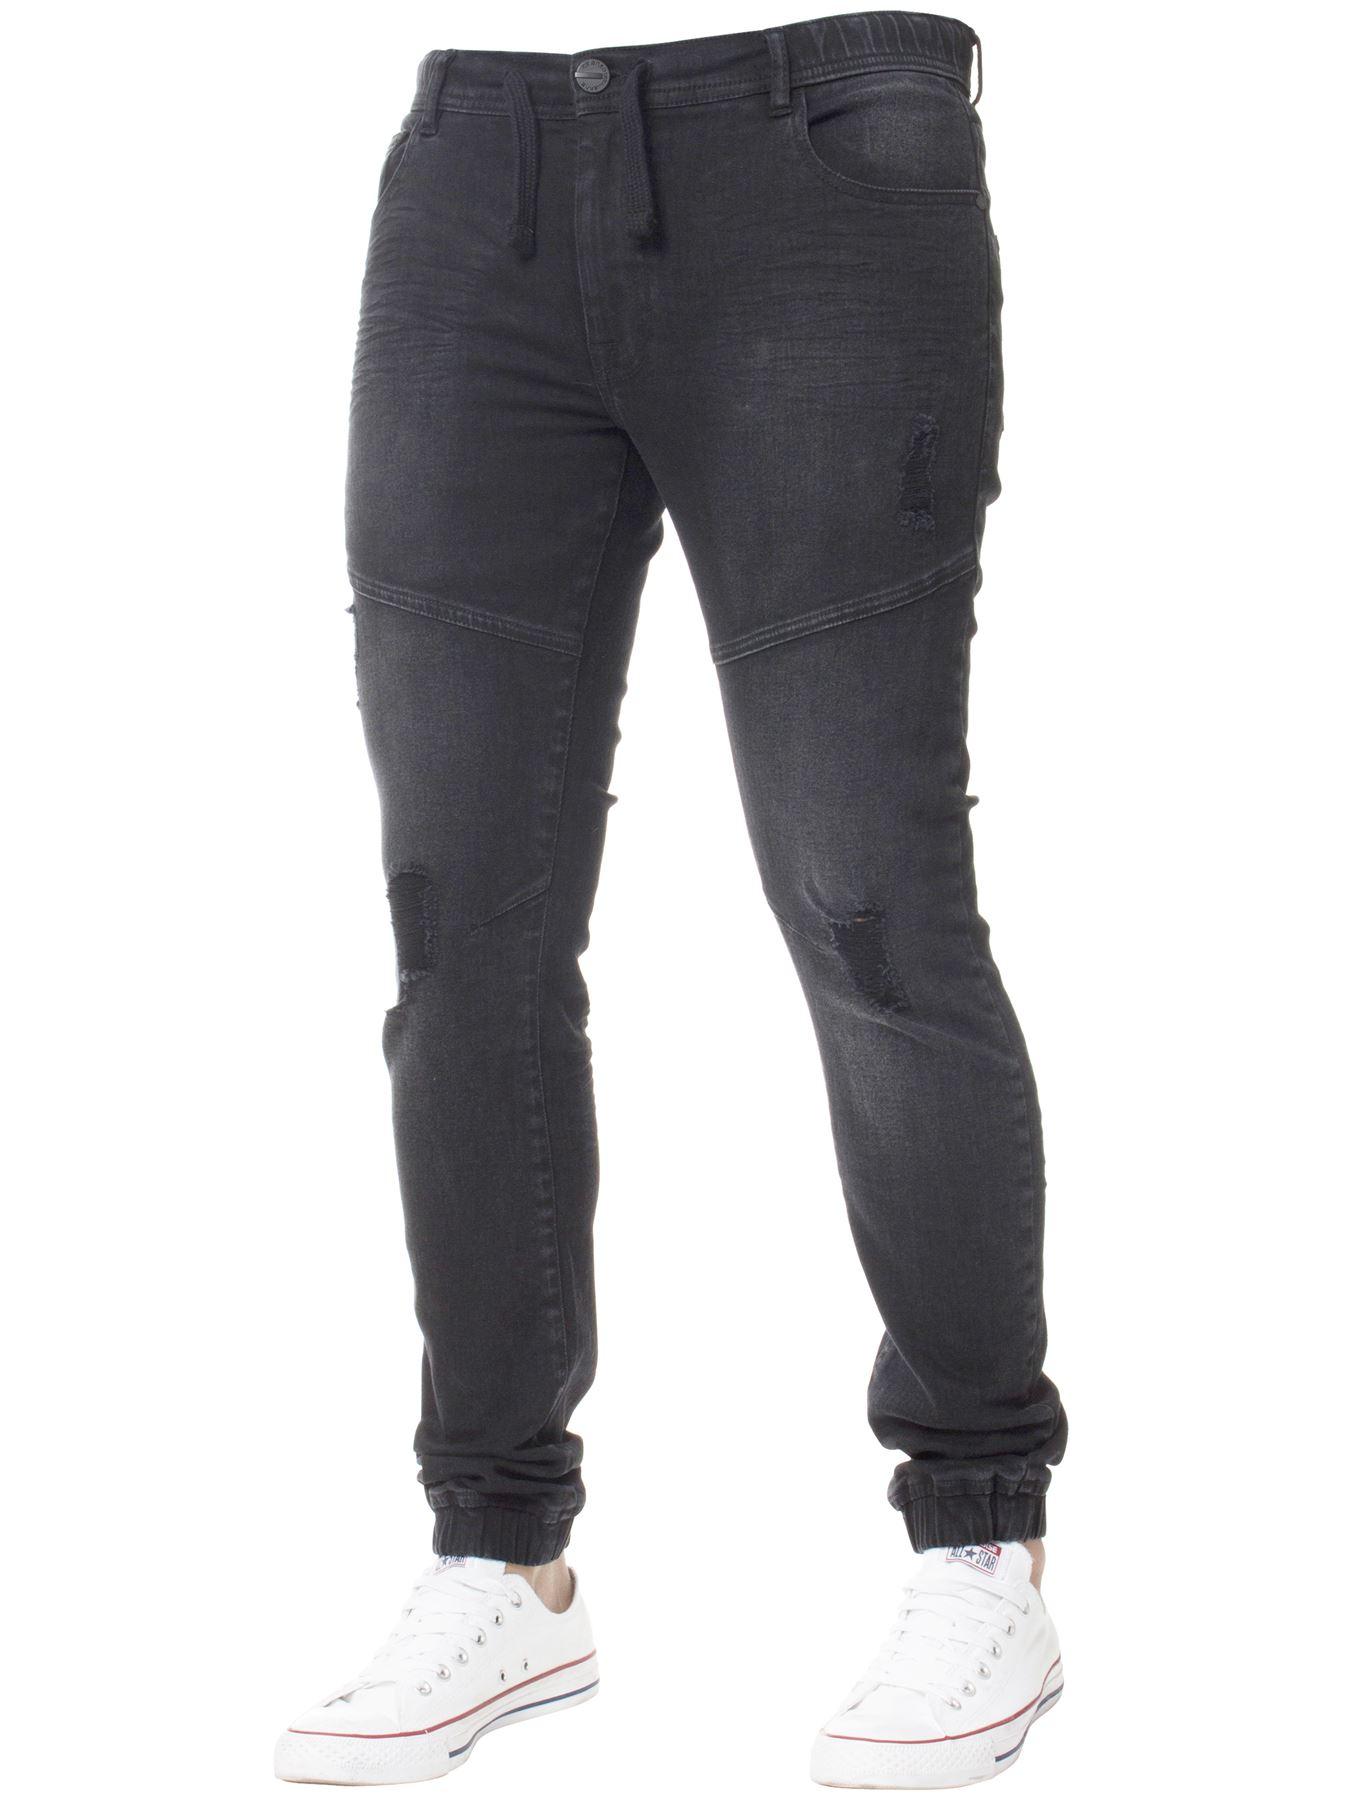 Enzo-Mens-Cuffed-Jeans-Stretch-Fit-Ripped-Denim-Jogger-Pants-Big-Tall-All-Waists thumbnail 3